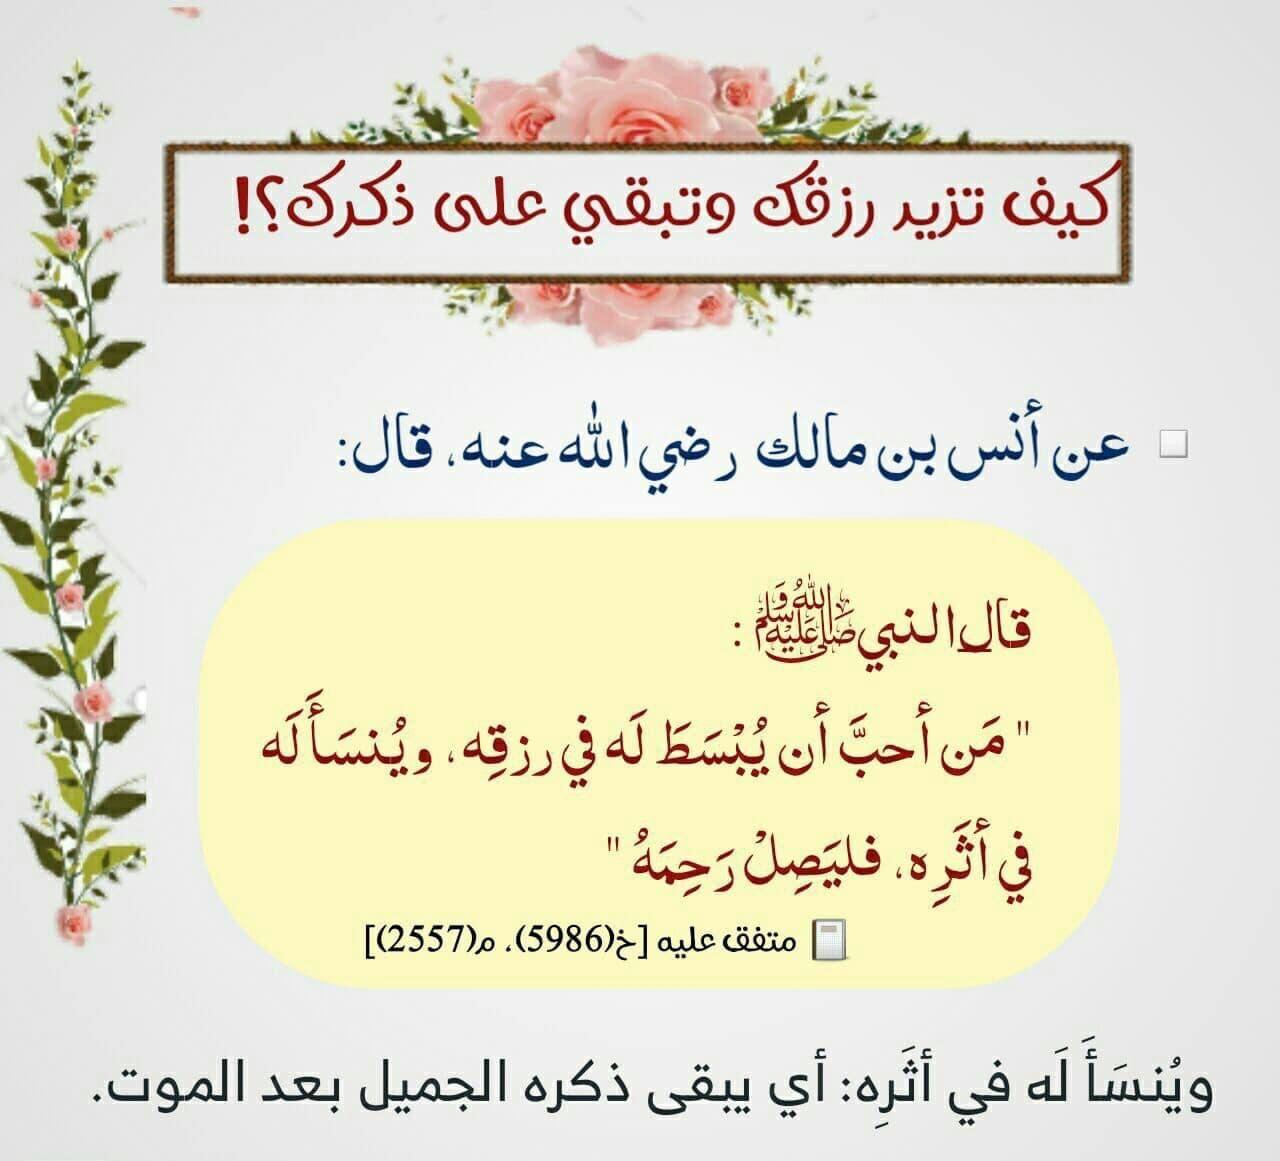 Pin By صفحات On أحاديث نبوية Quran Verses Arabic Quotes Verses